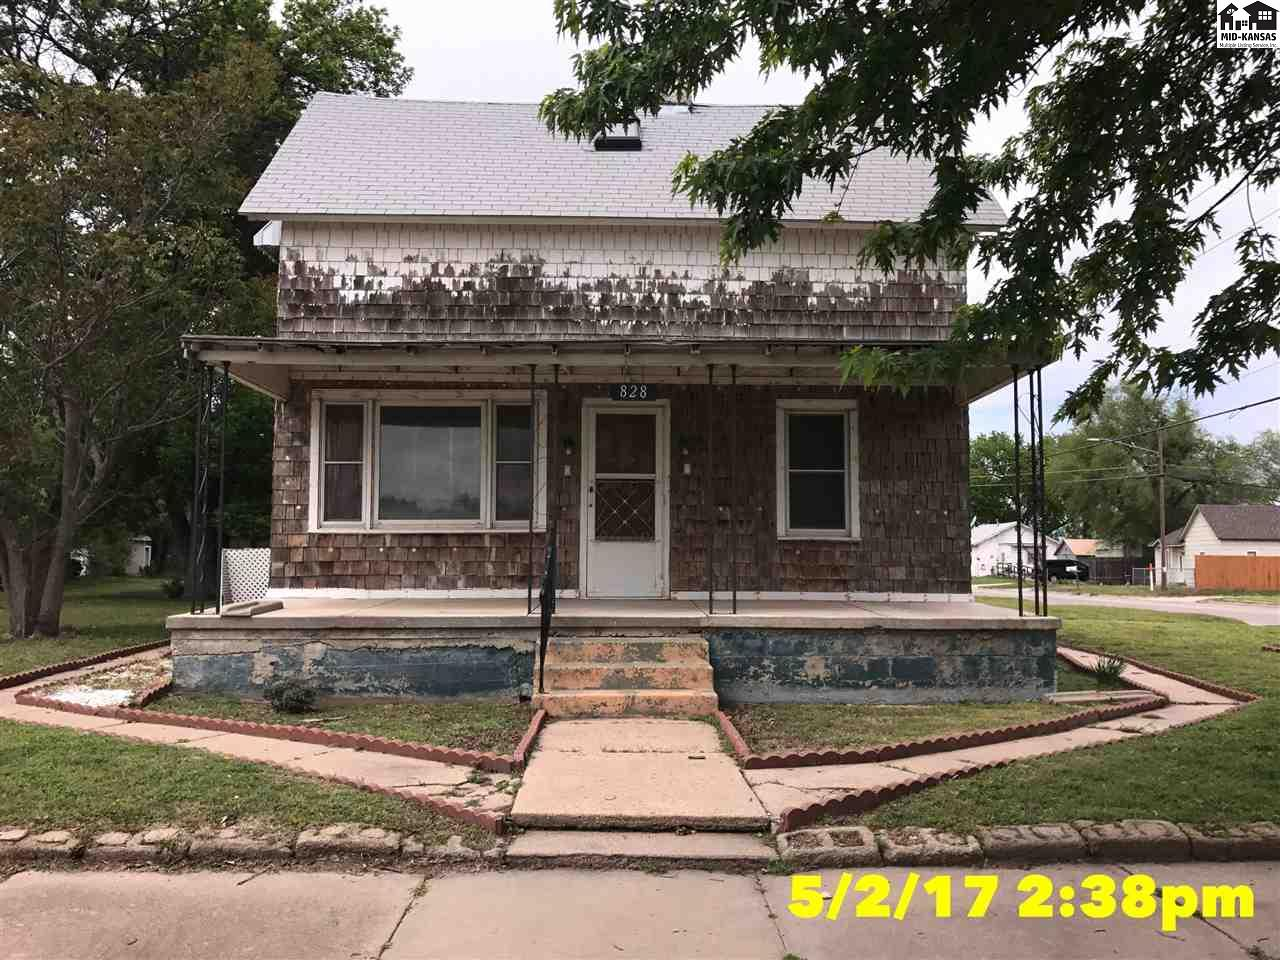 828 E 2nd Ave, Hutchinson, KS 67501